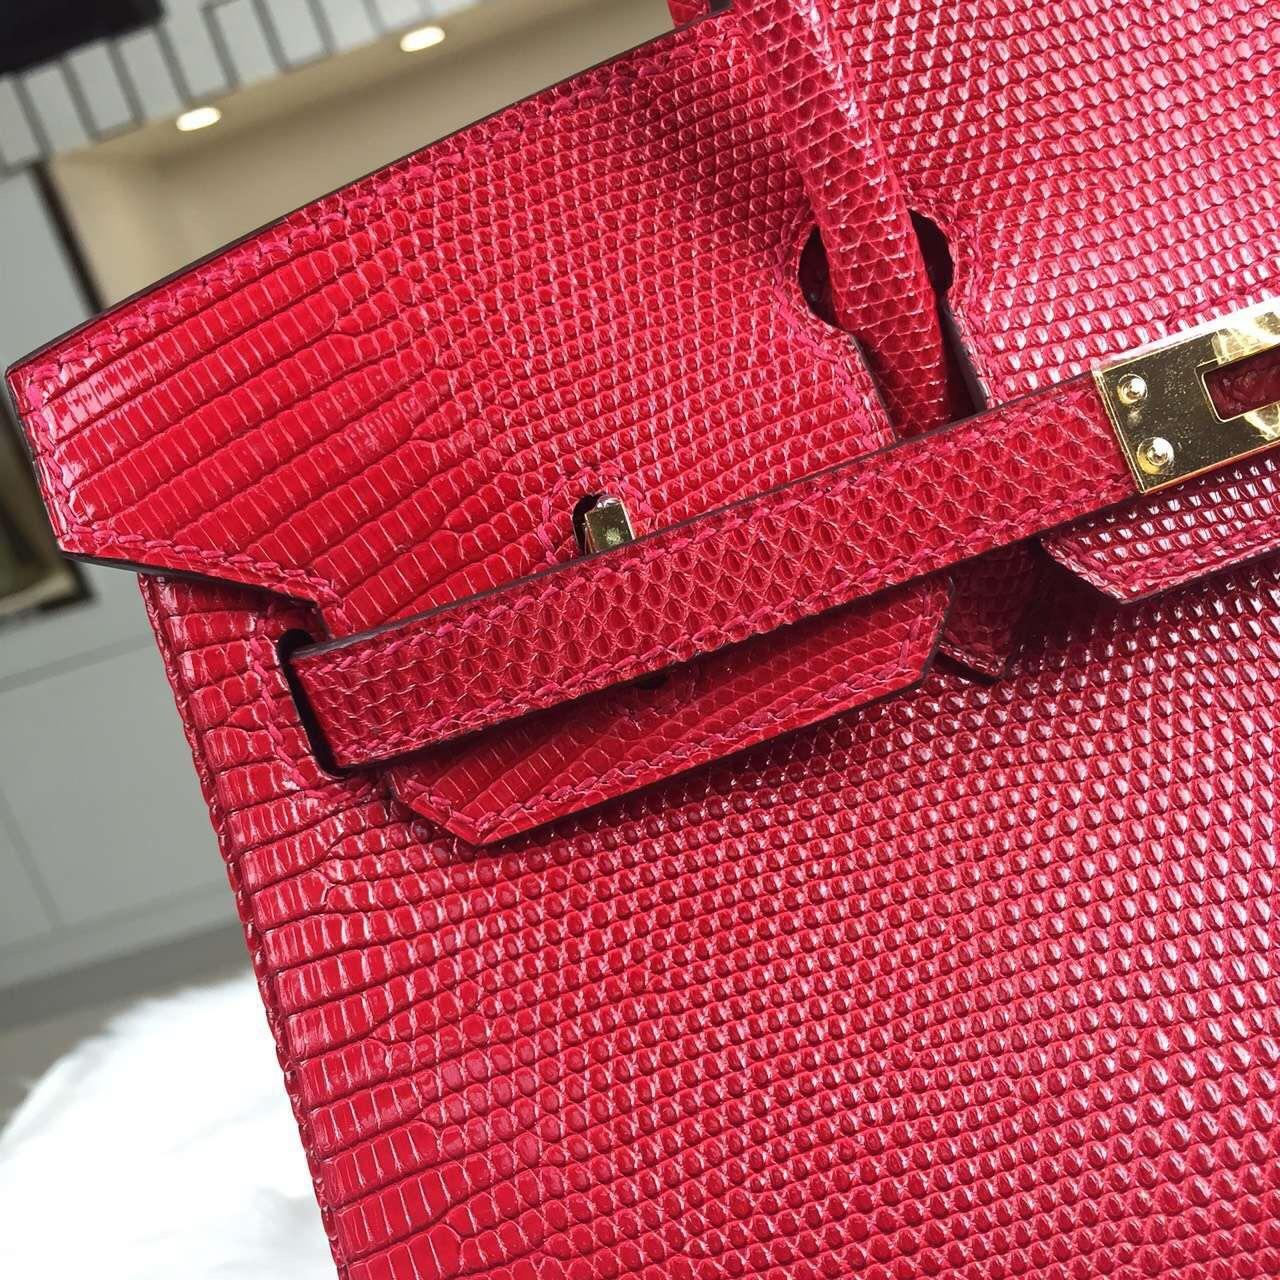 Hand Stitching Hermes Ferrari Red Lizard Skin Birkin25 Gold Hardware